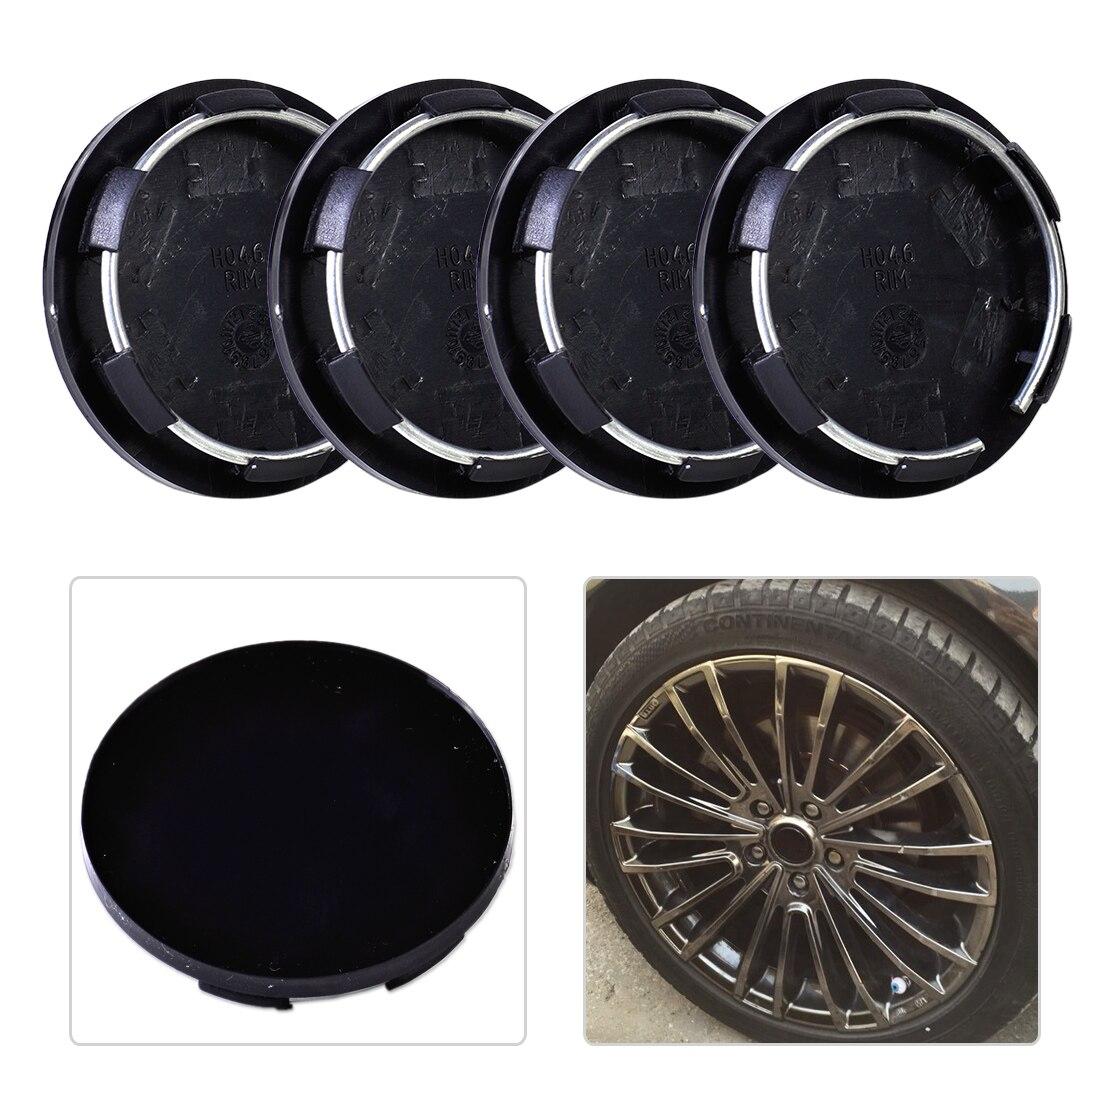 4X 60MM Chrome ABS Unniversal Wheel Center Hub Cap Covers Silver Transformer Decepticon Symbol Bad Guy Badges Emblem